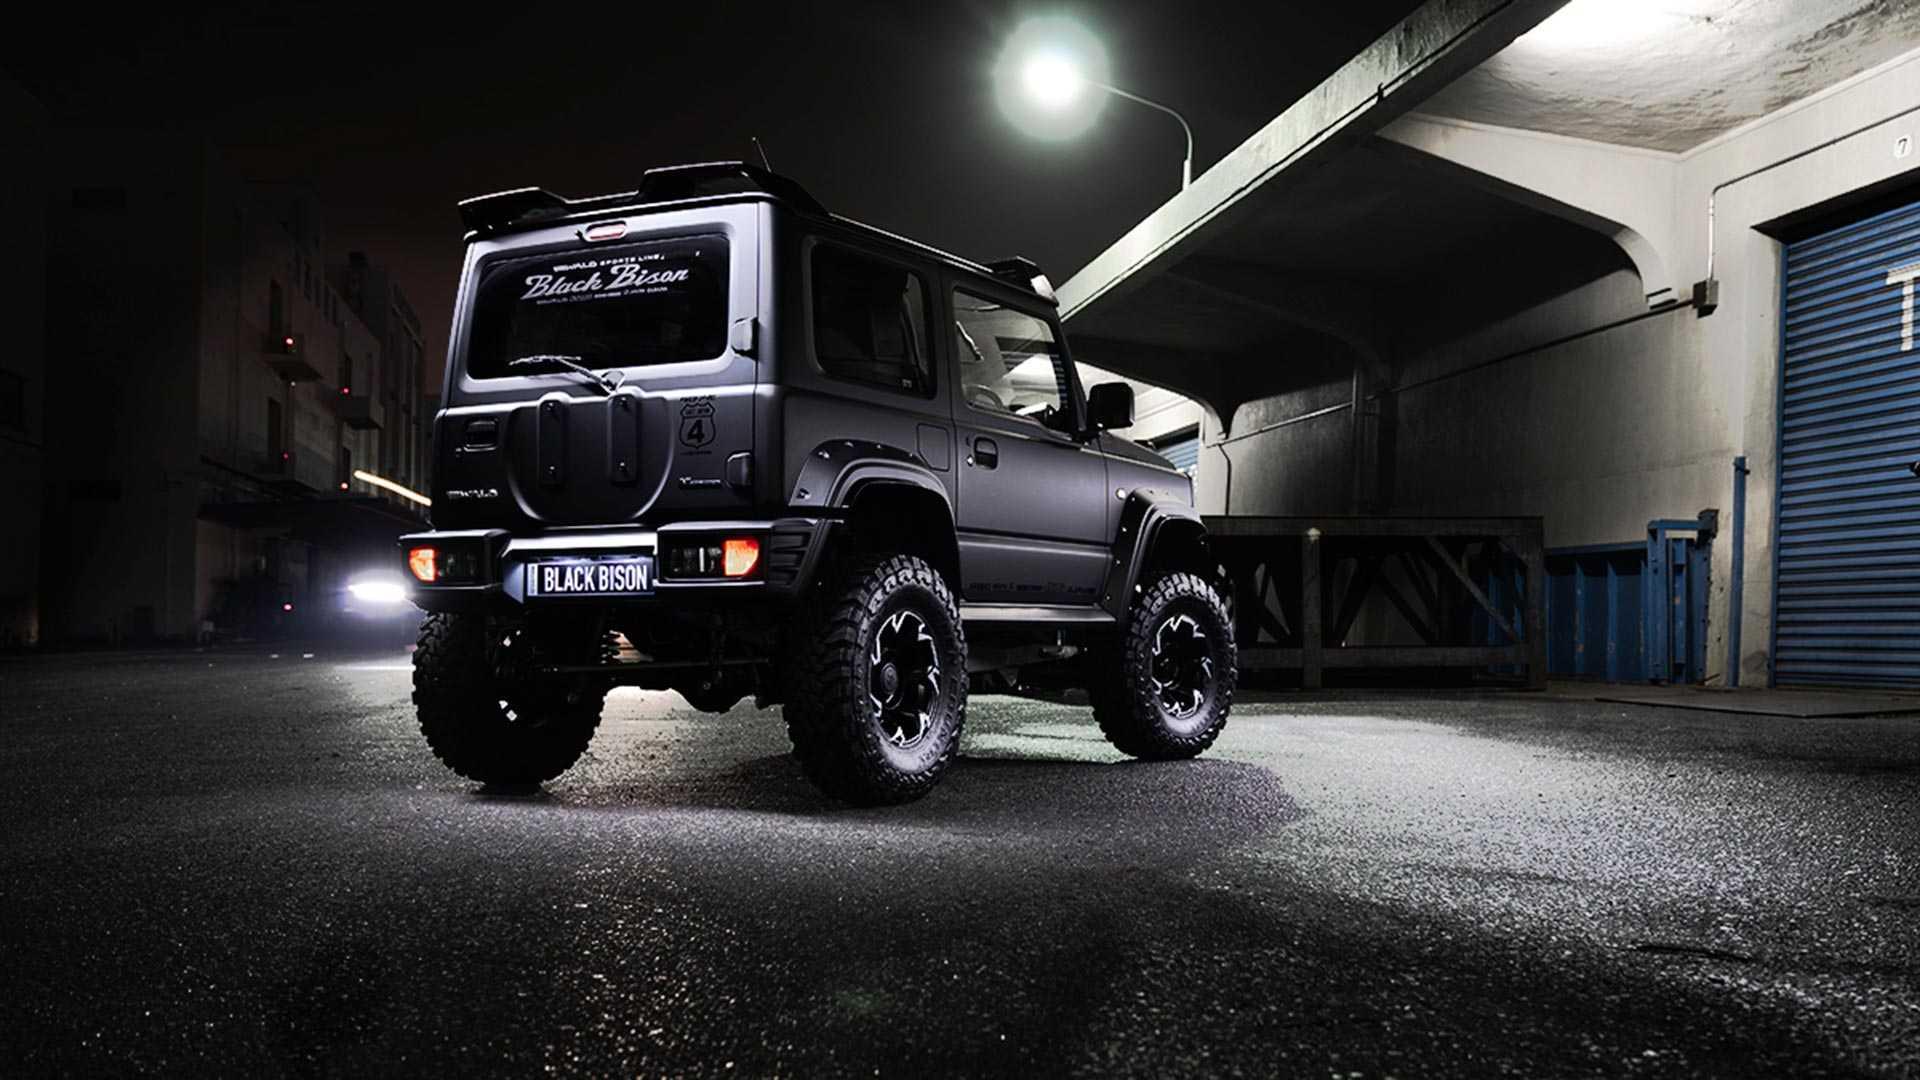 Suzuki Jimny Black Bison by Wald International